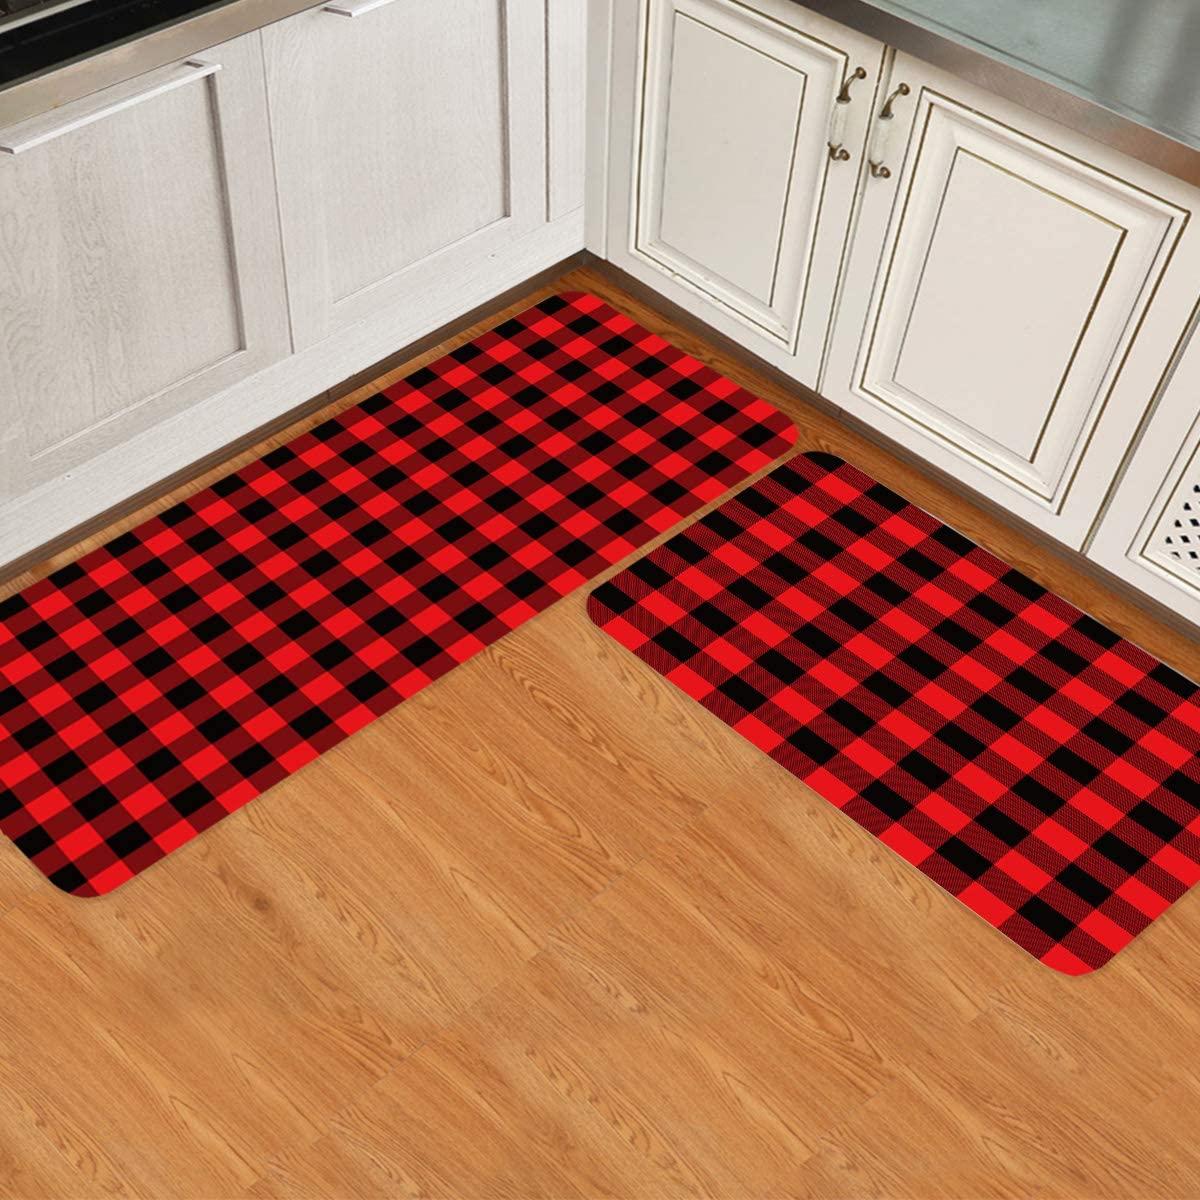 Prime Leader 2 Piece Non-Slip Kitchen Rug Doormat Runner Mat Set Cheap OFFicial shop